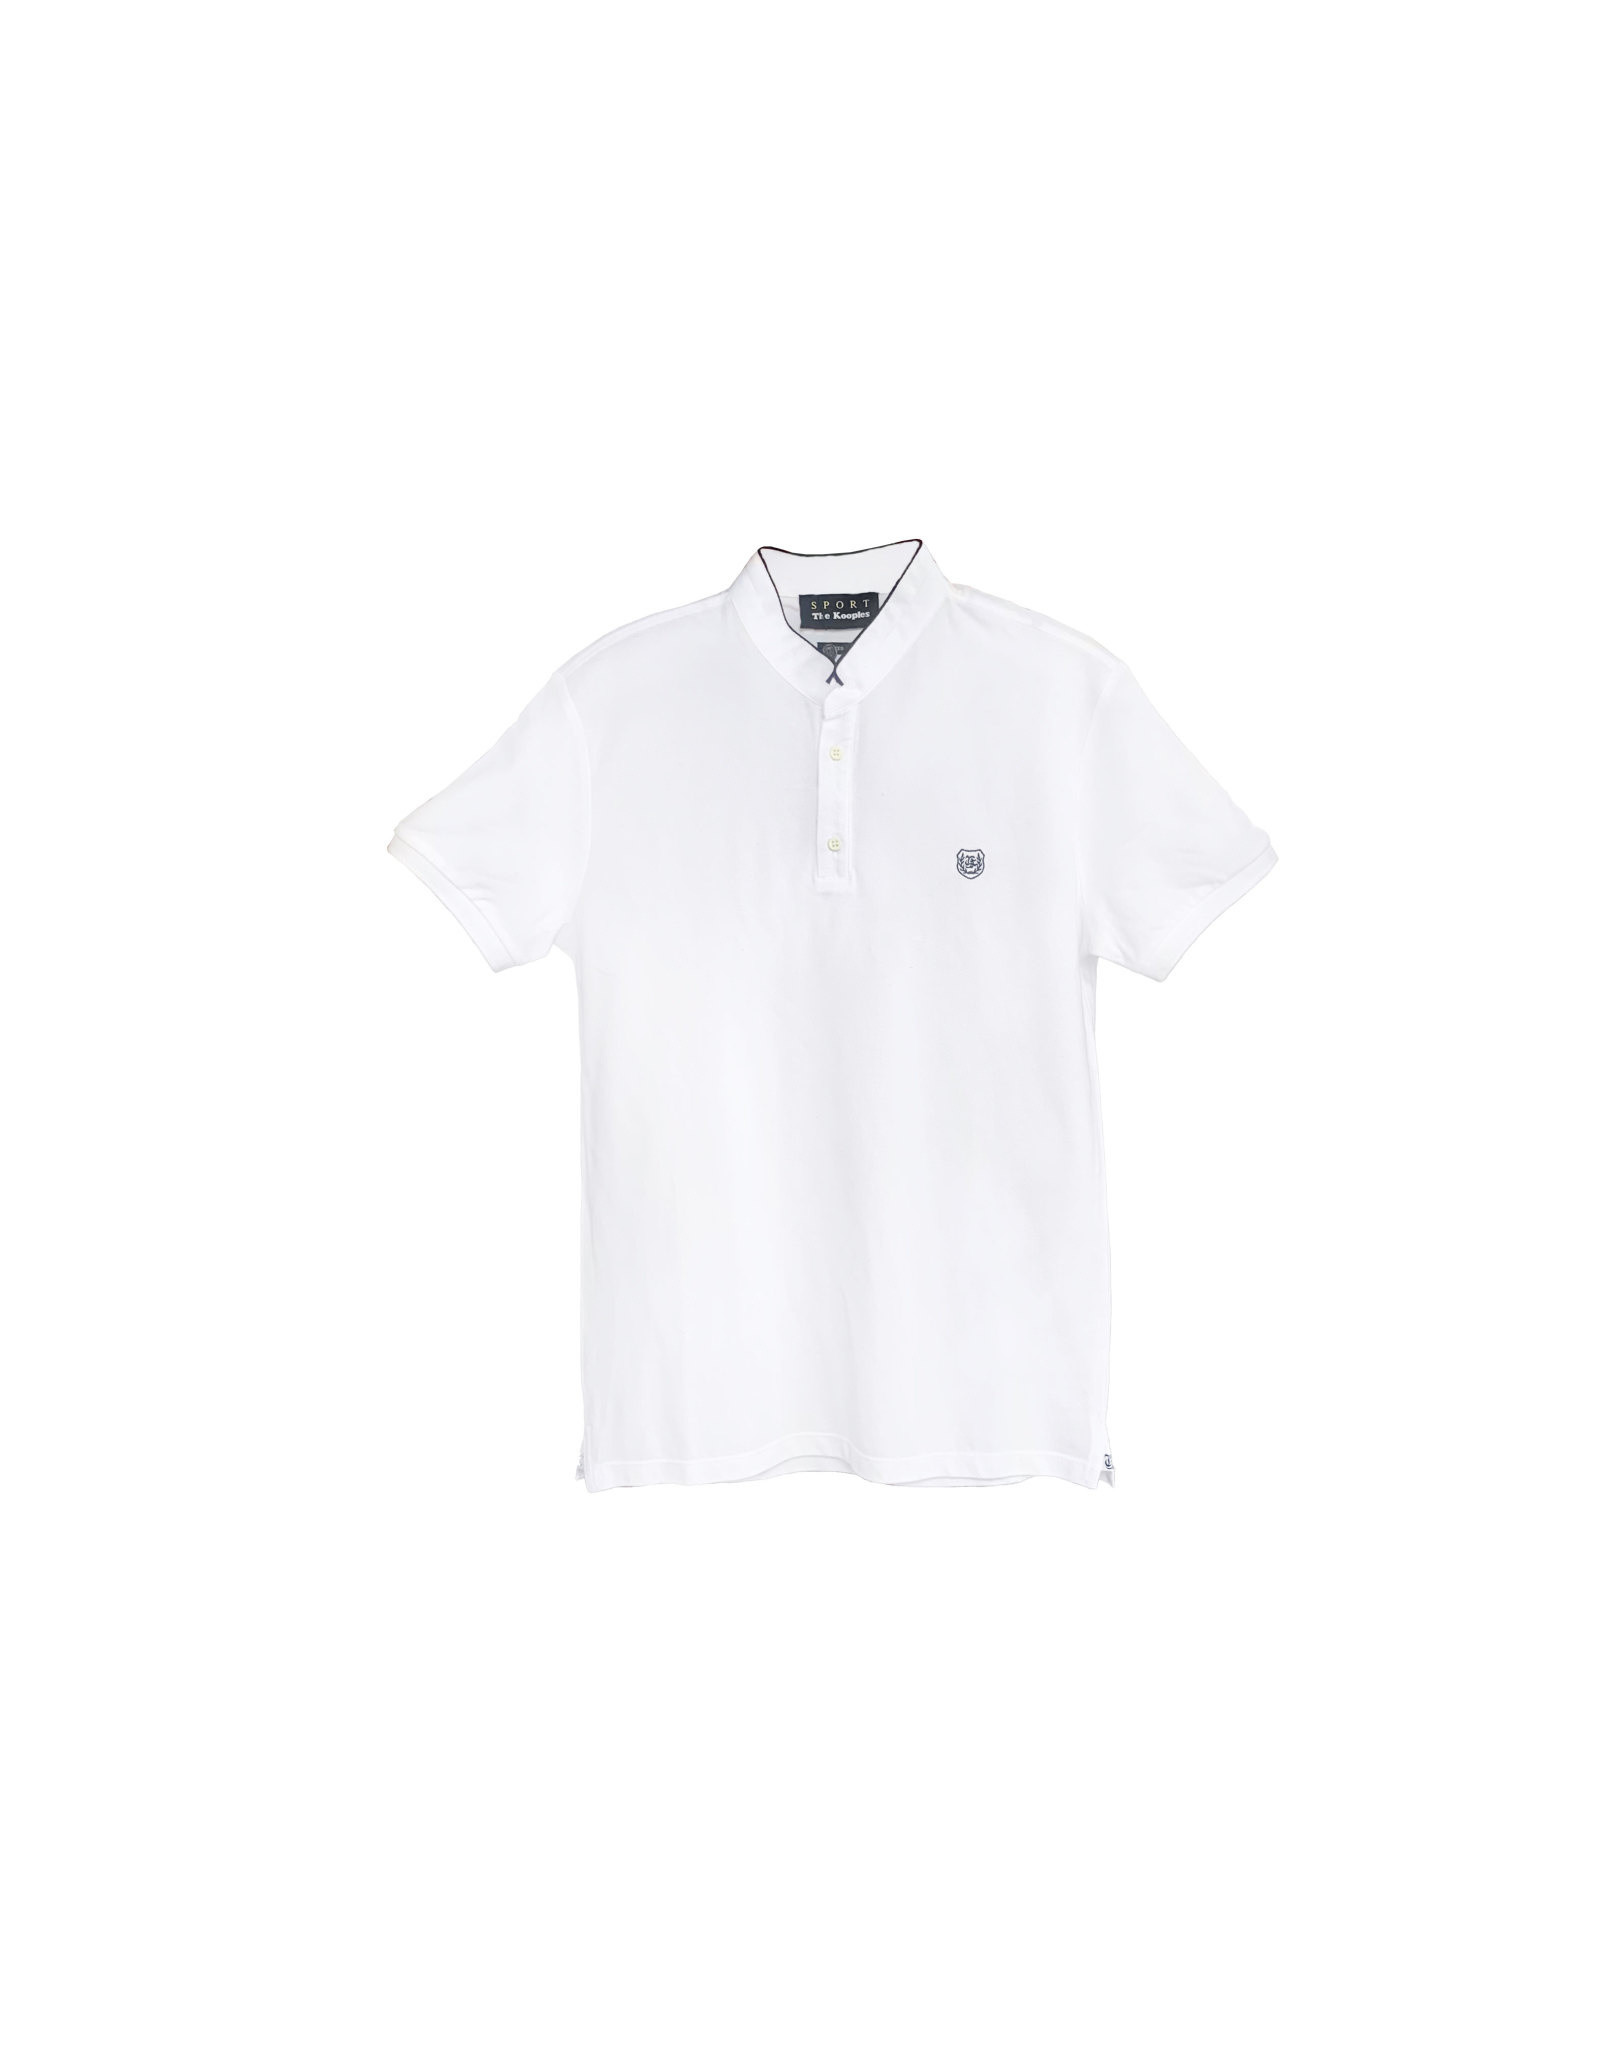 SPORT  The Kooples SPORT The Kooples  Tshirt  Size S